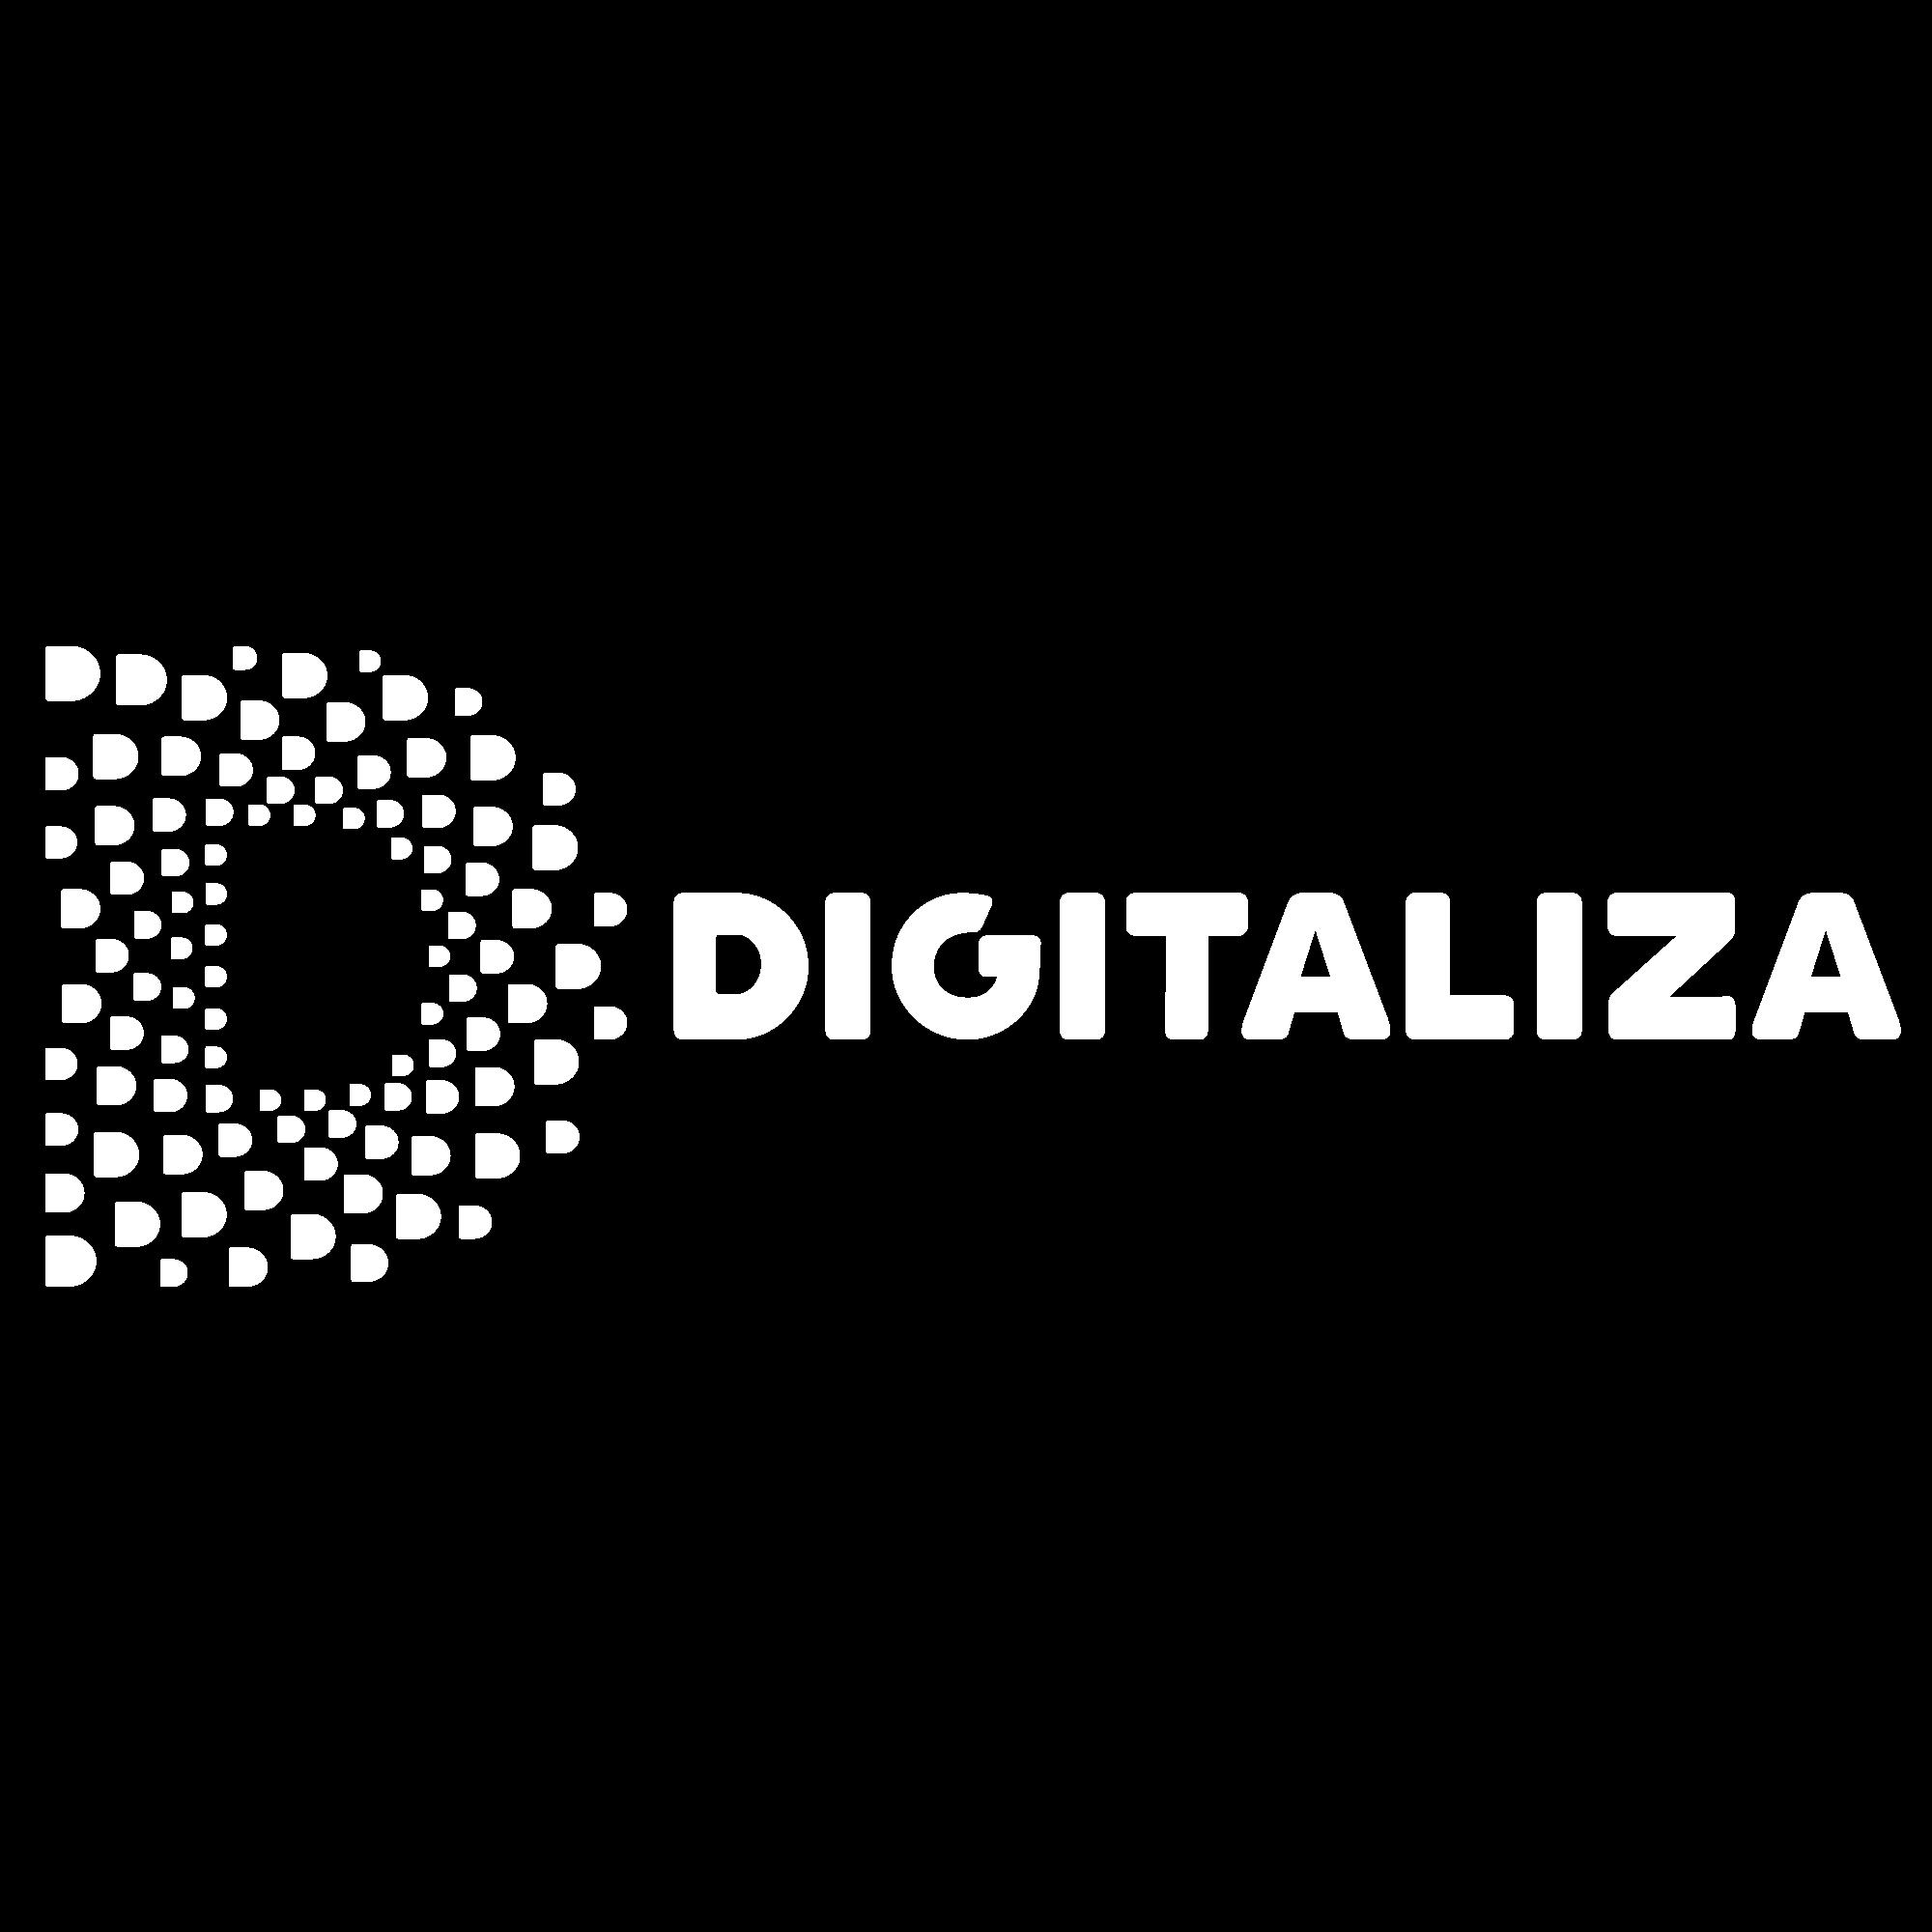 Logo-digitaliza-3